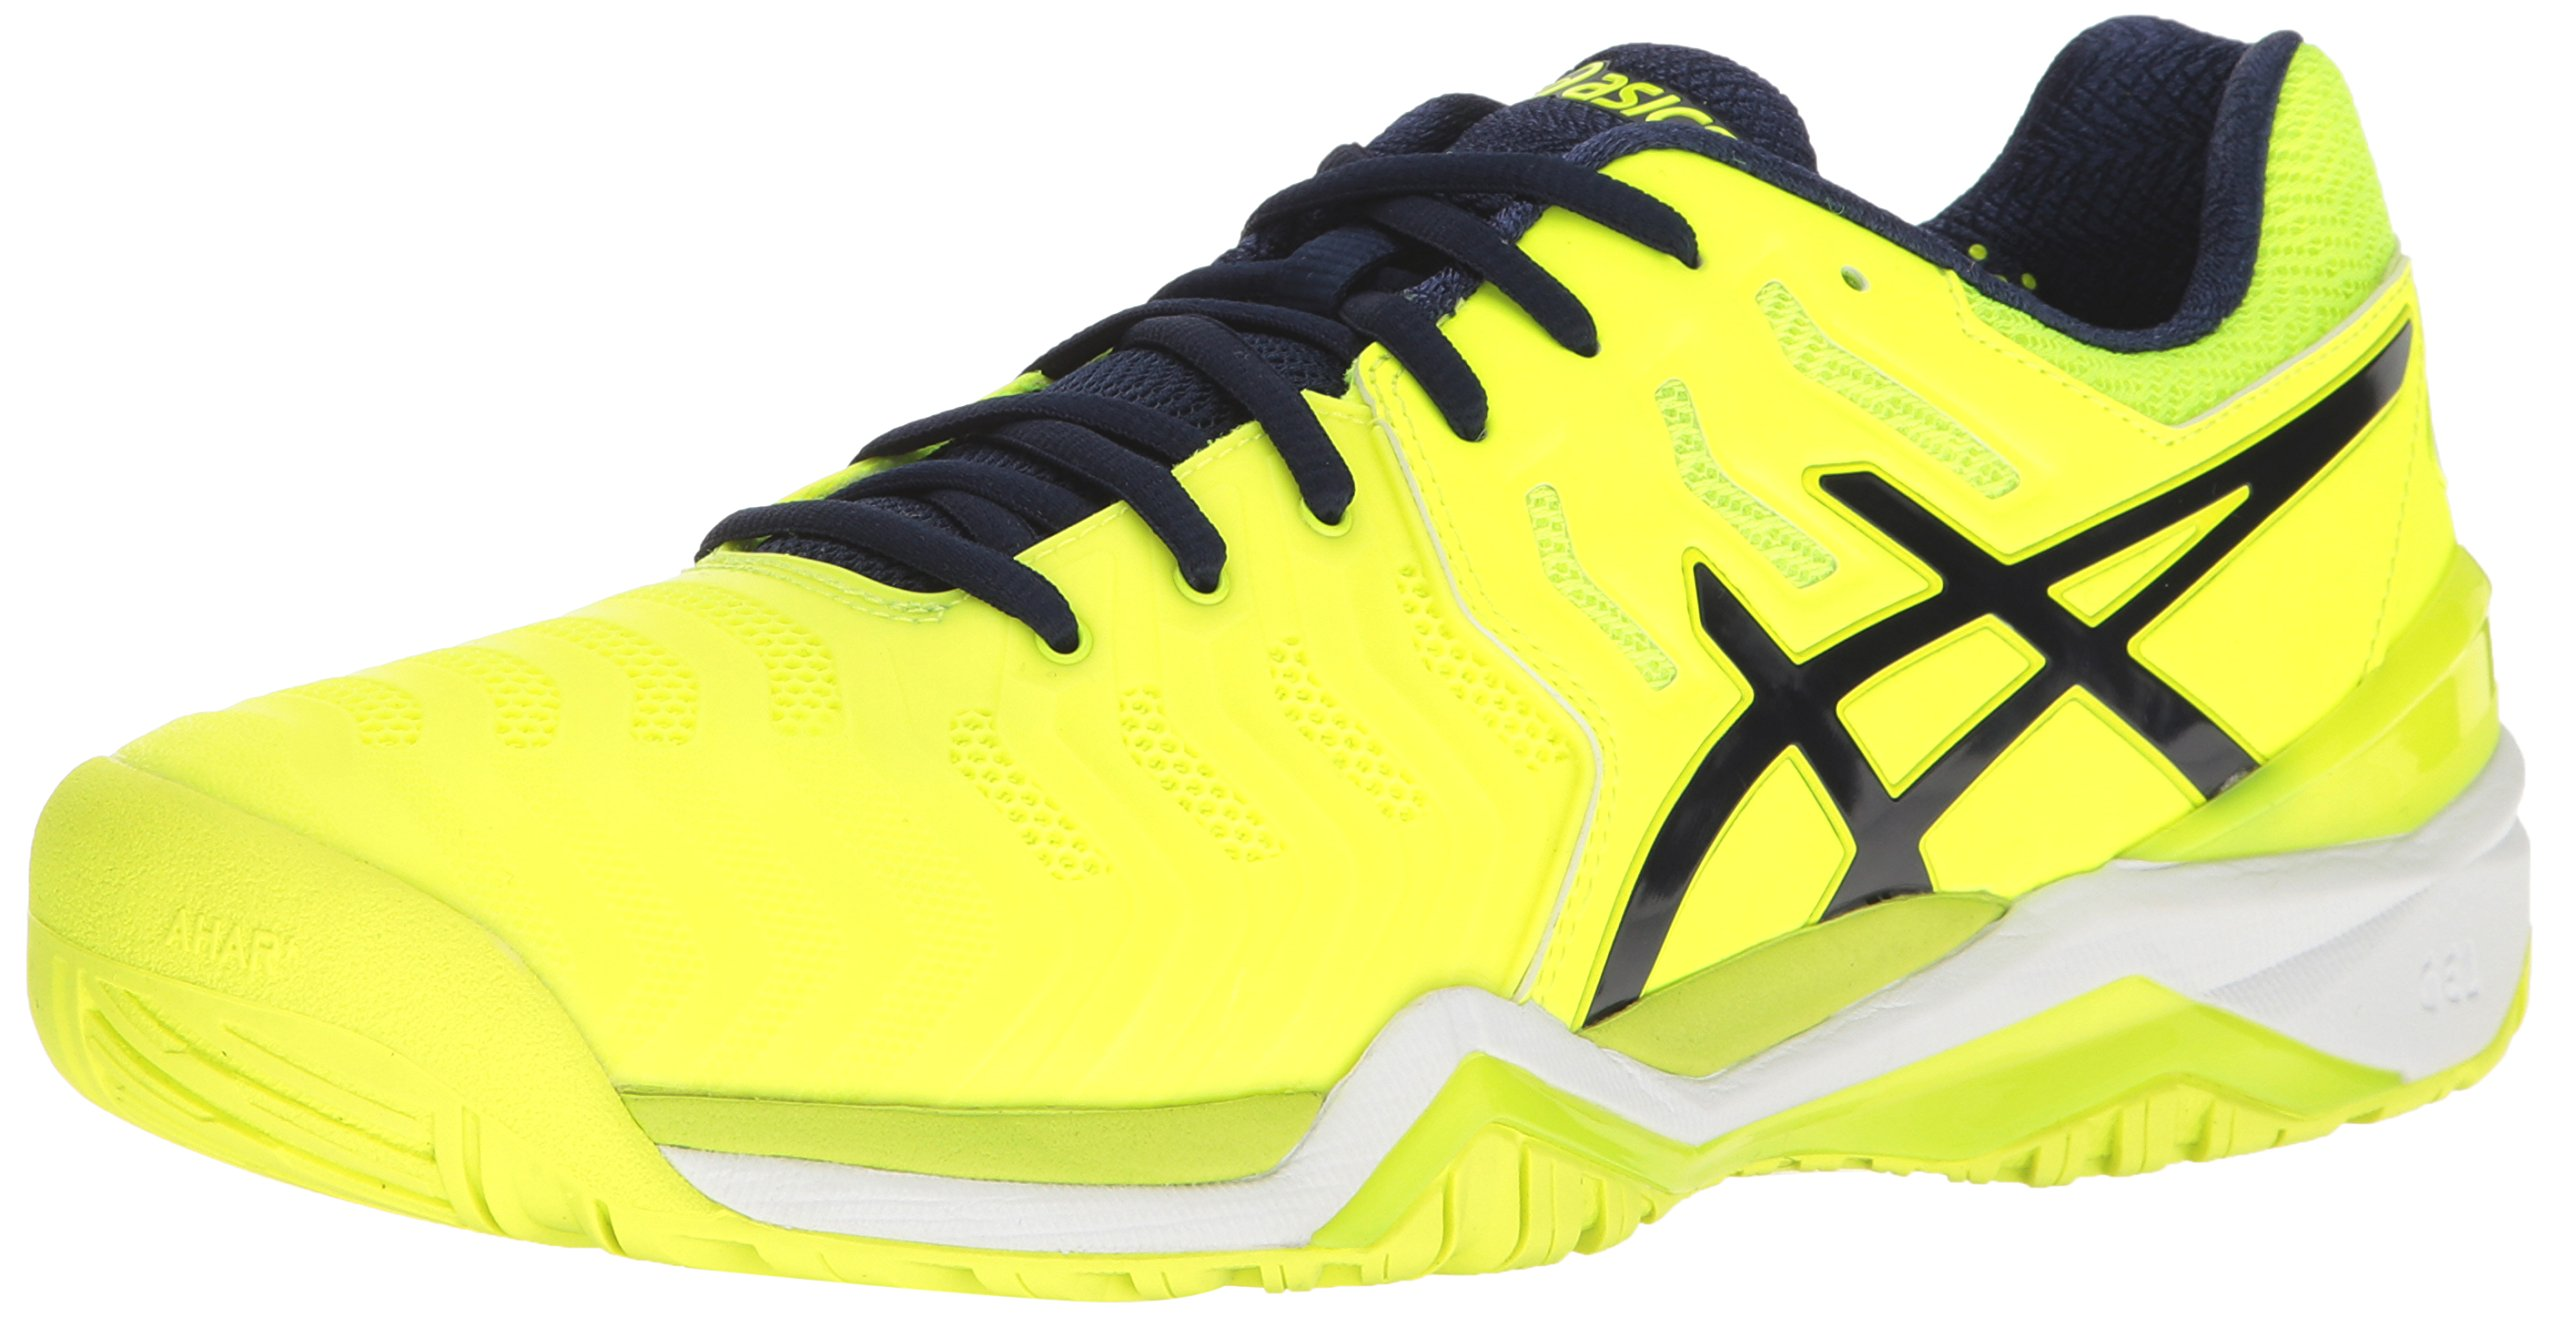 ASICS Men's Gel-Resolution 7 Tennis Shoe, Safety Yellow/Indigo Blue/White, 10.5 M US by ASICS